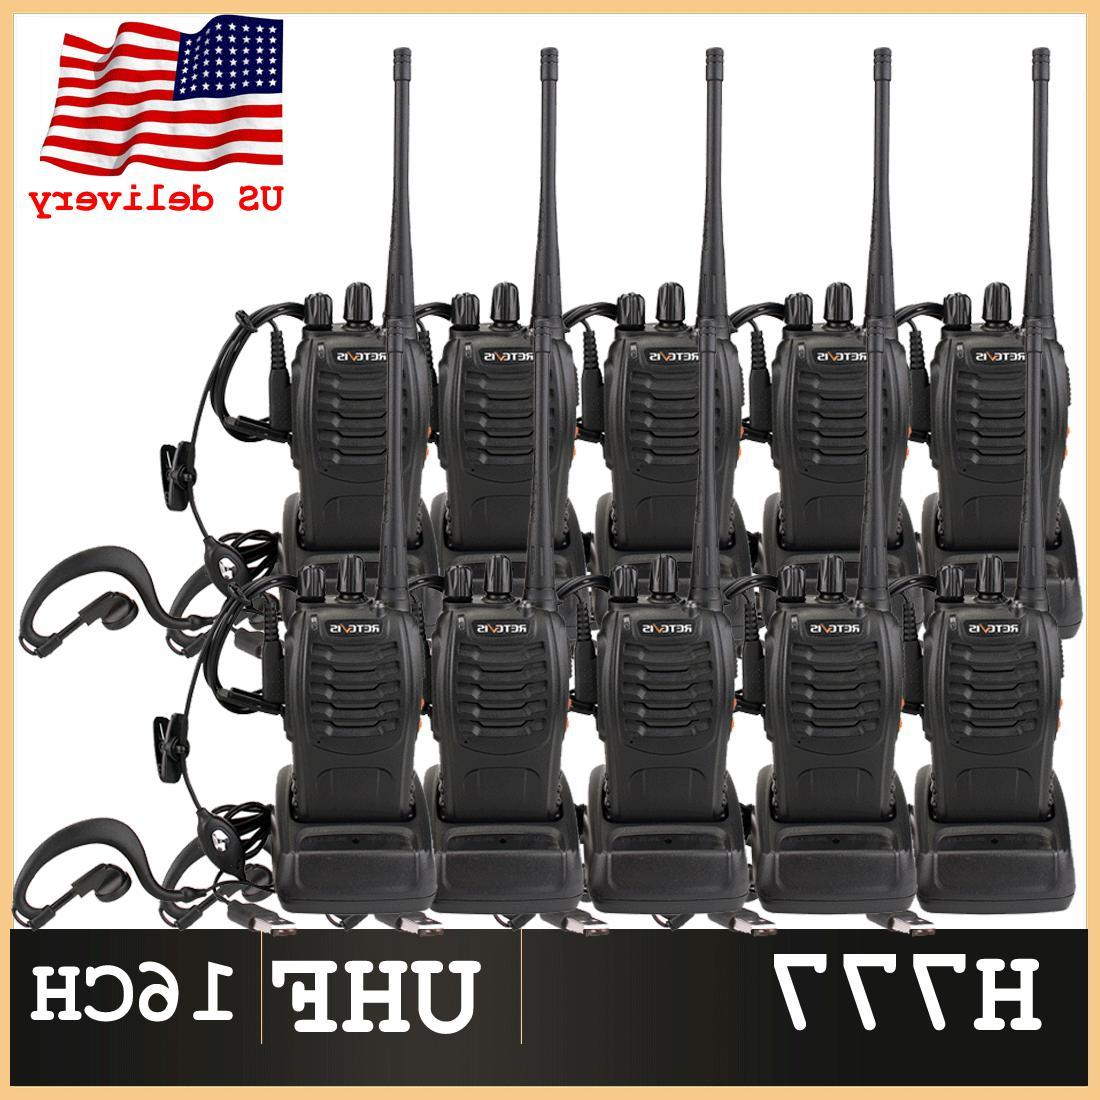 10xretevis h777 walkie talkies uhf 400 470mhz